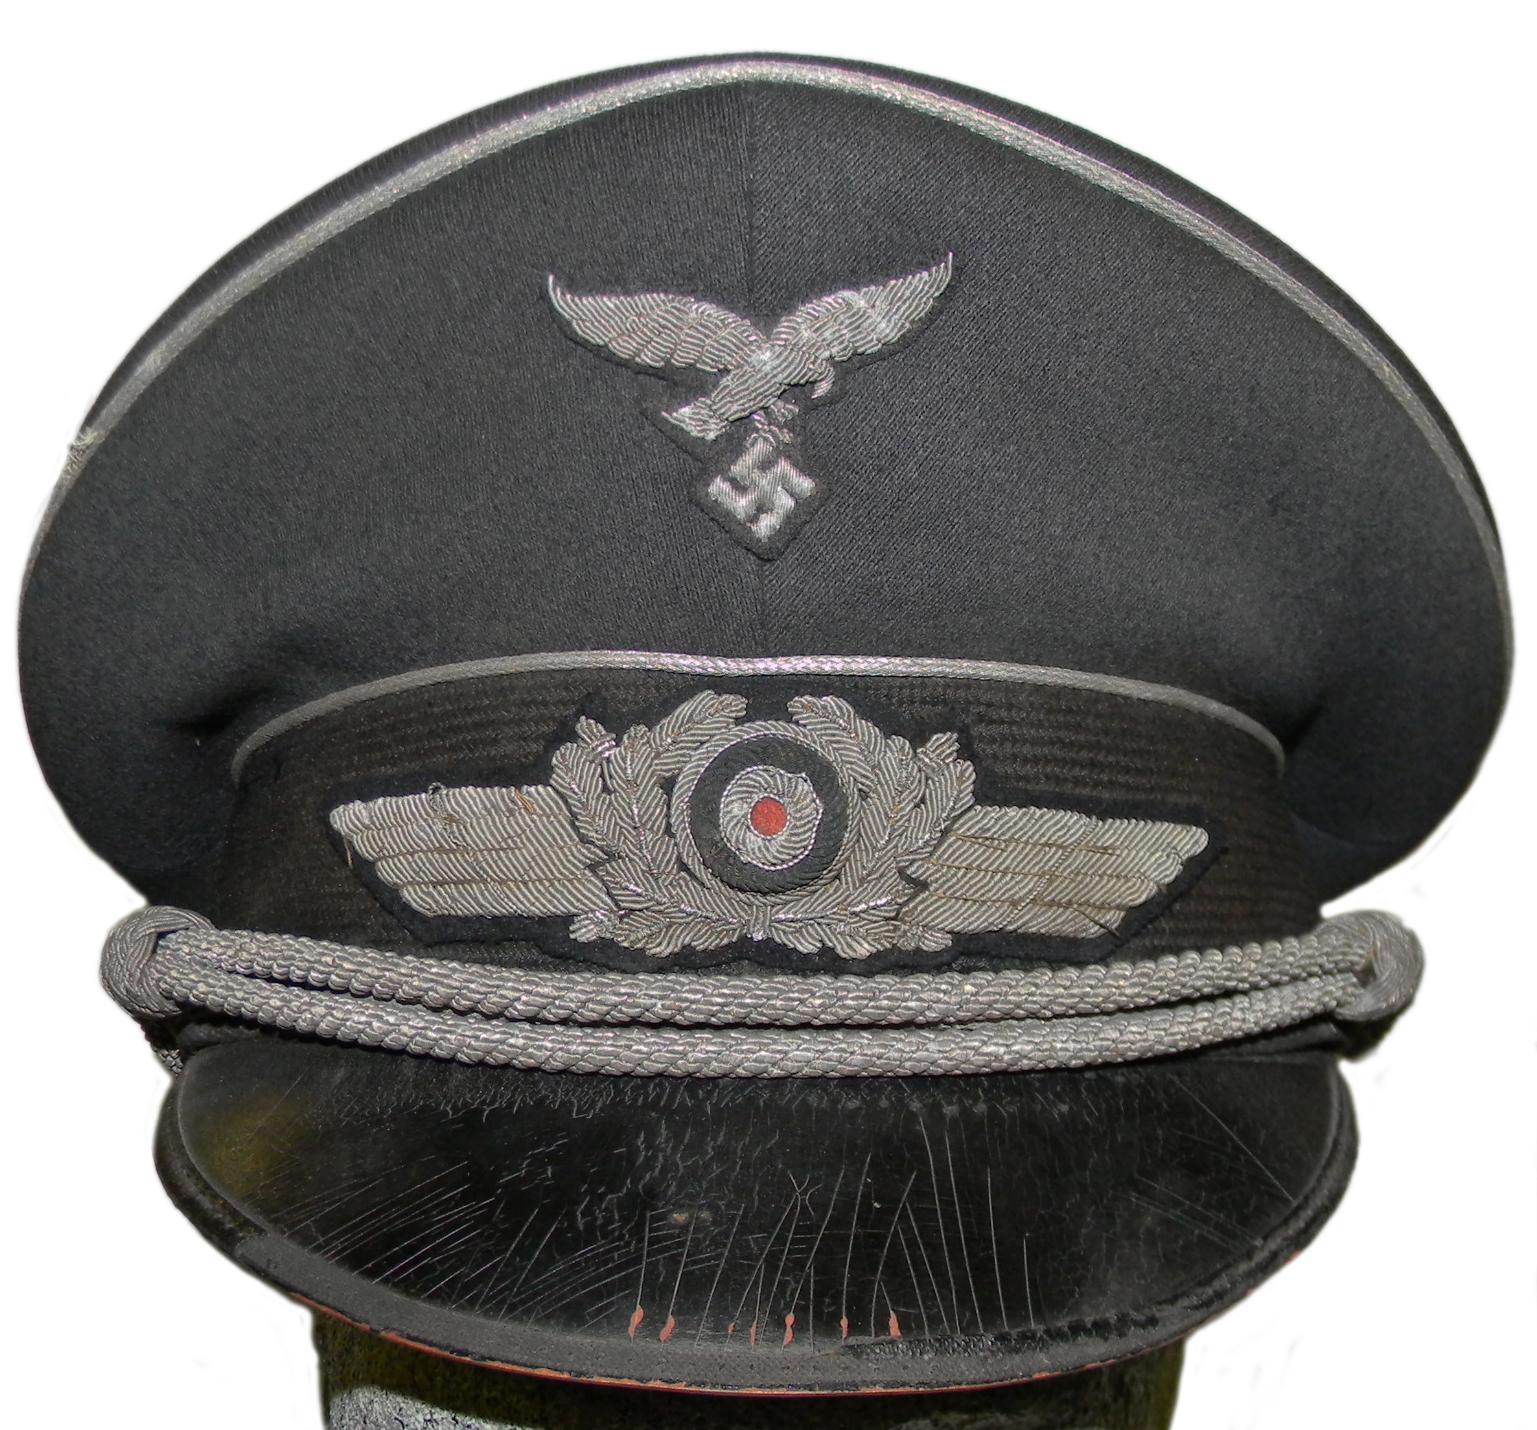 LW offiucer's cap by Erel